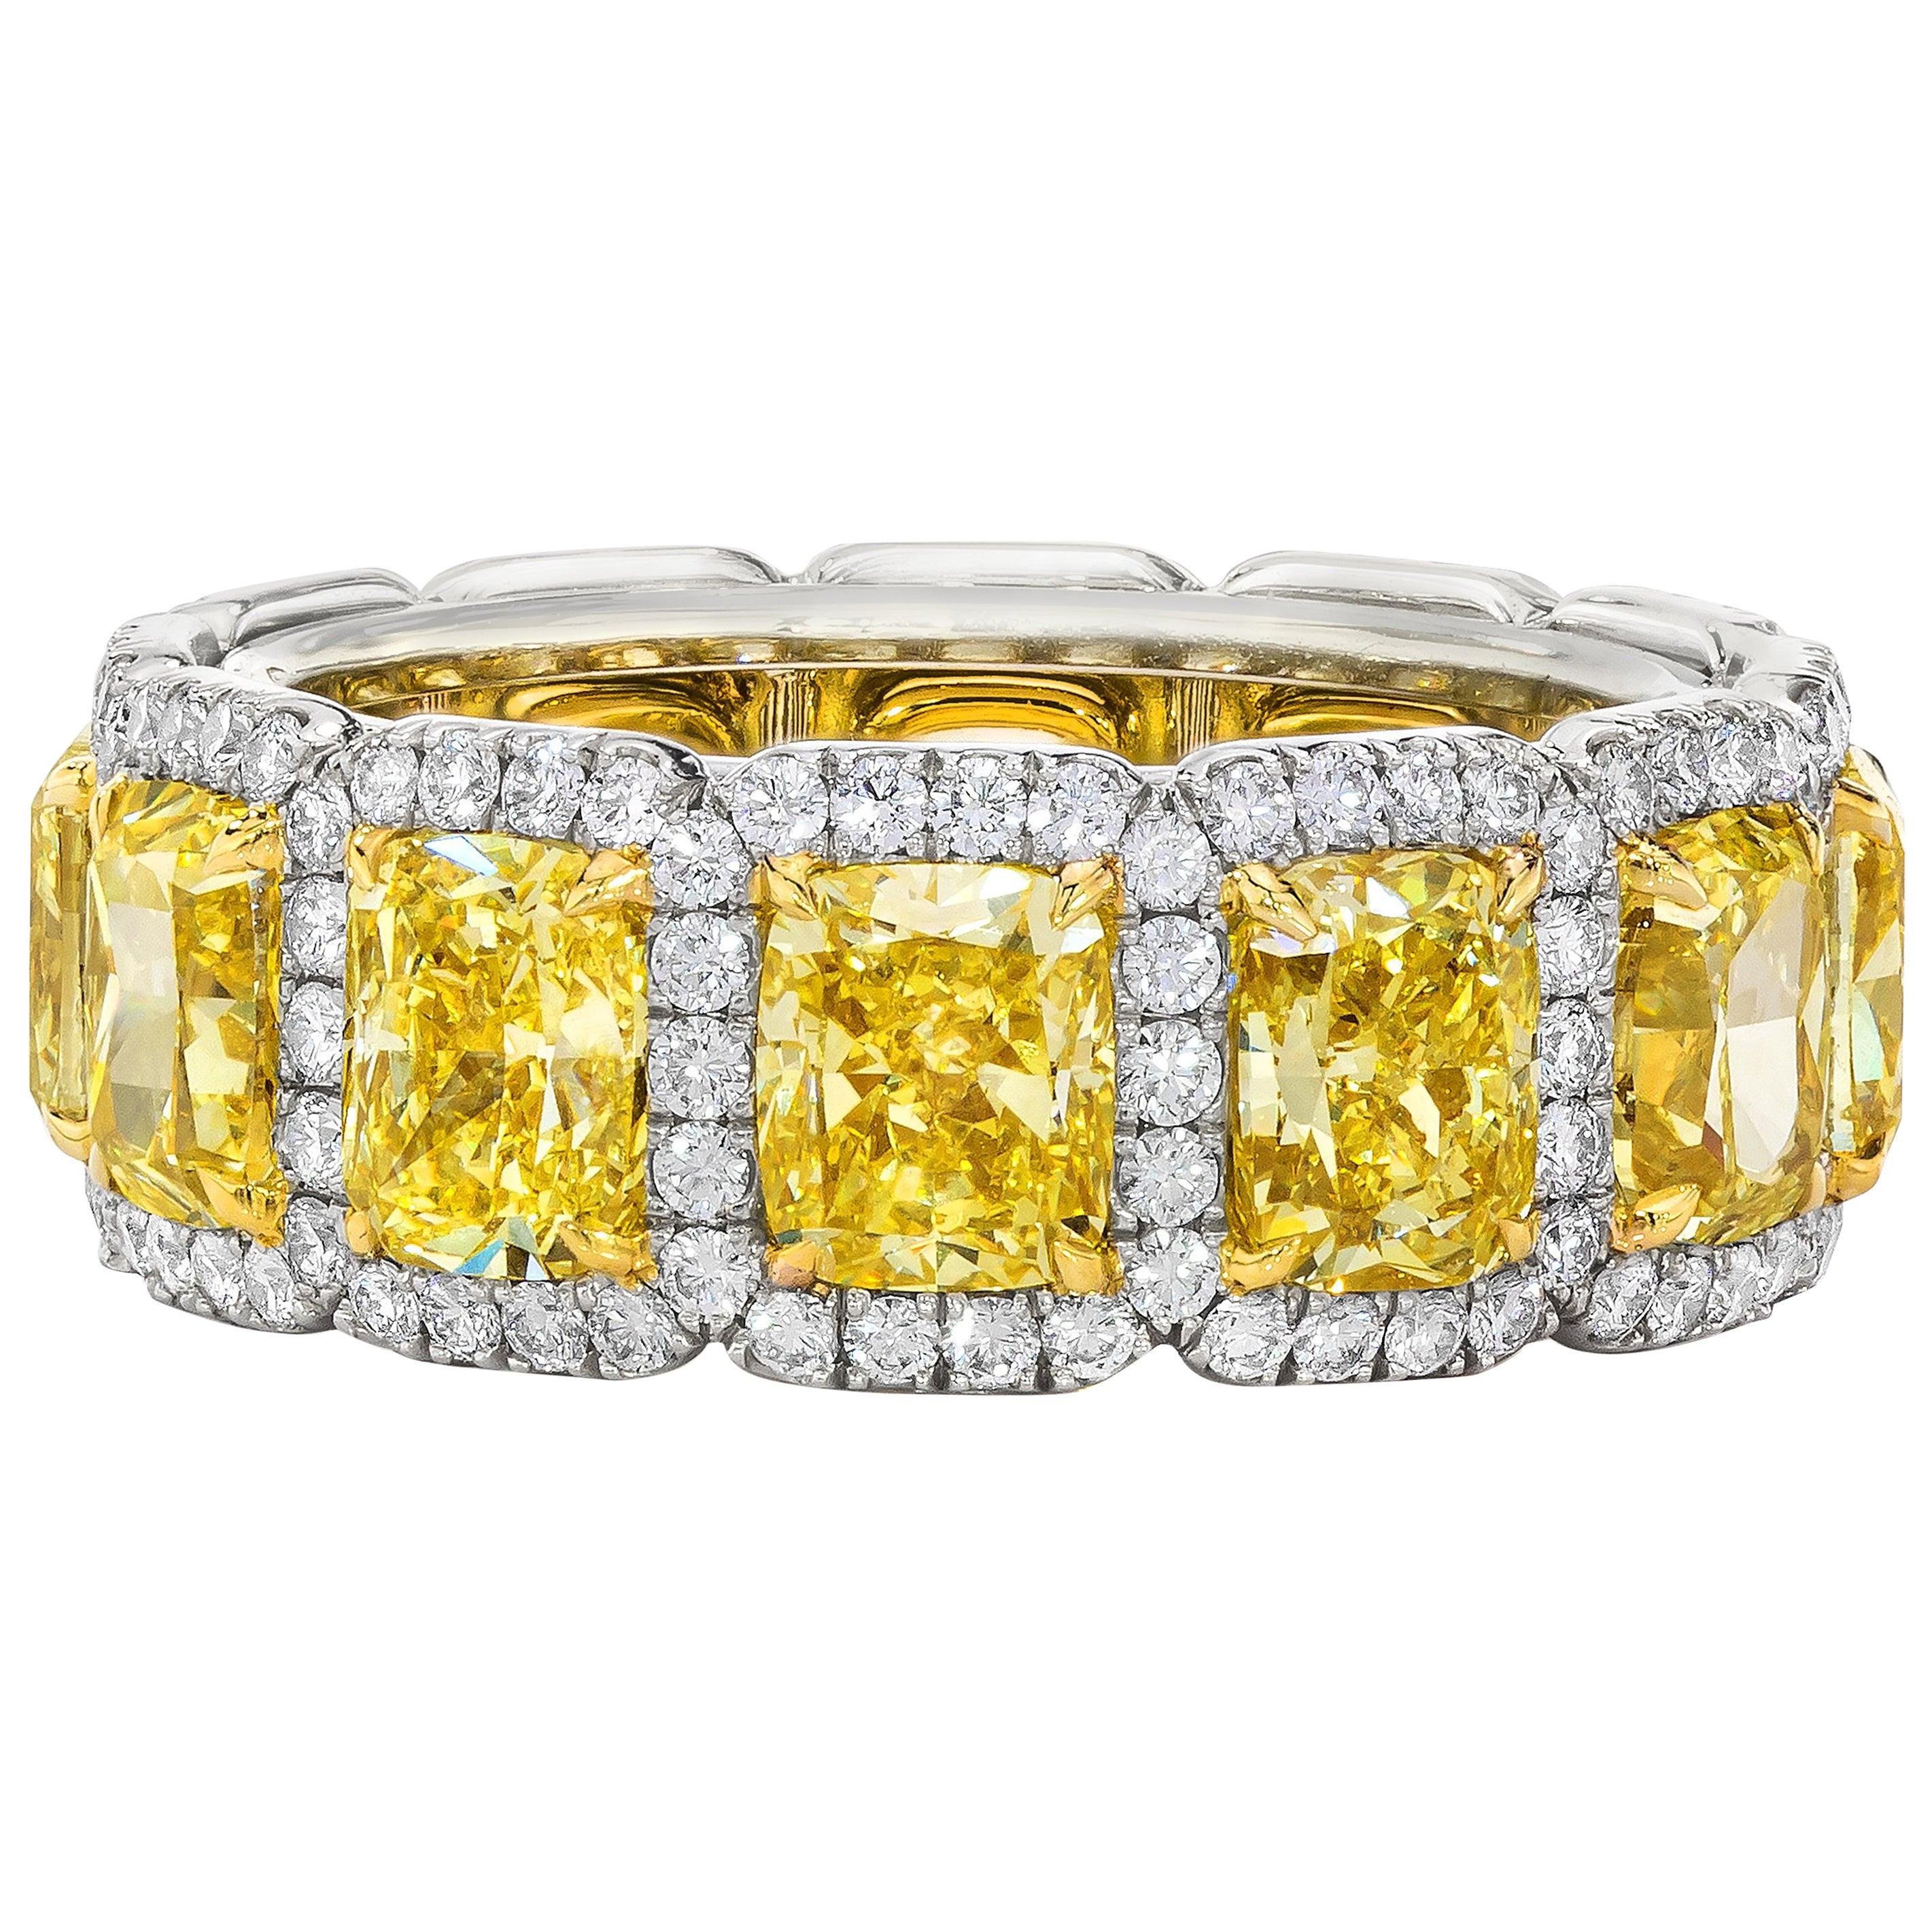 Roman Malakov 7.05 Carat Intense Yellow Diamond Eternity Wedding Band